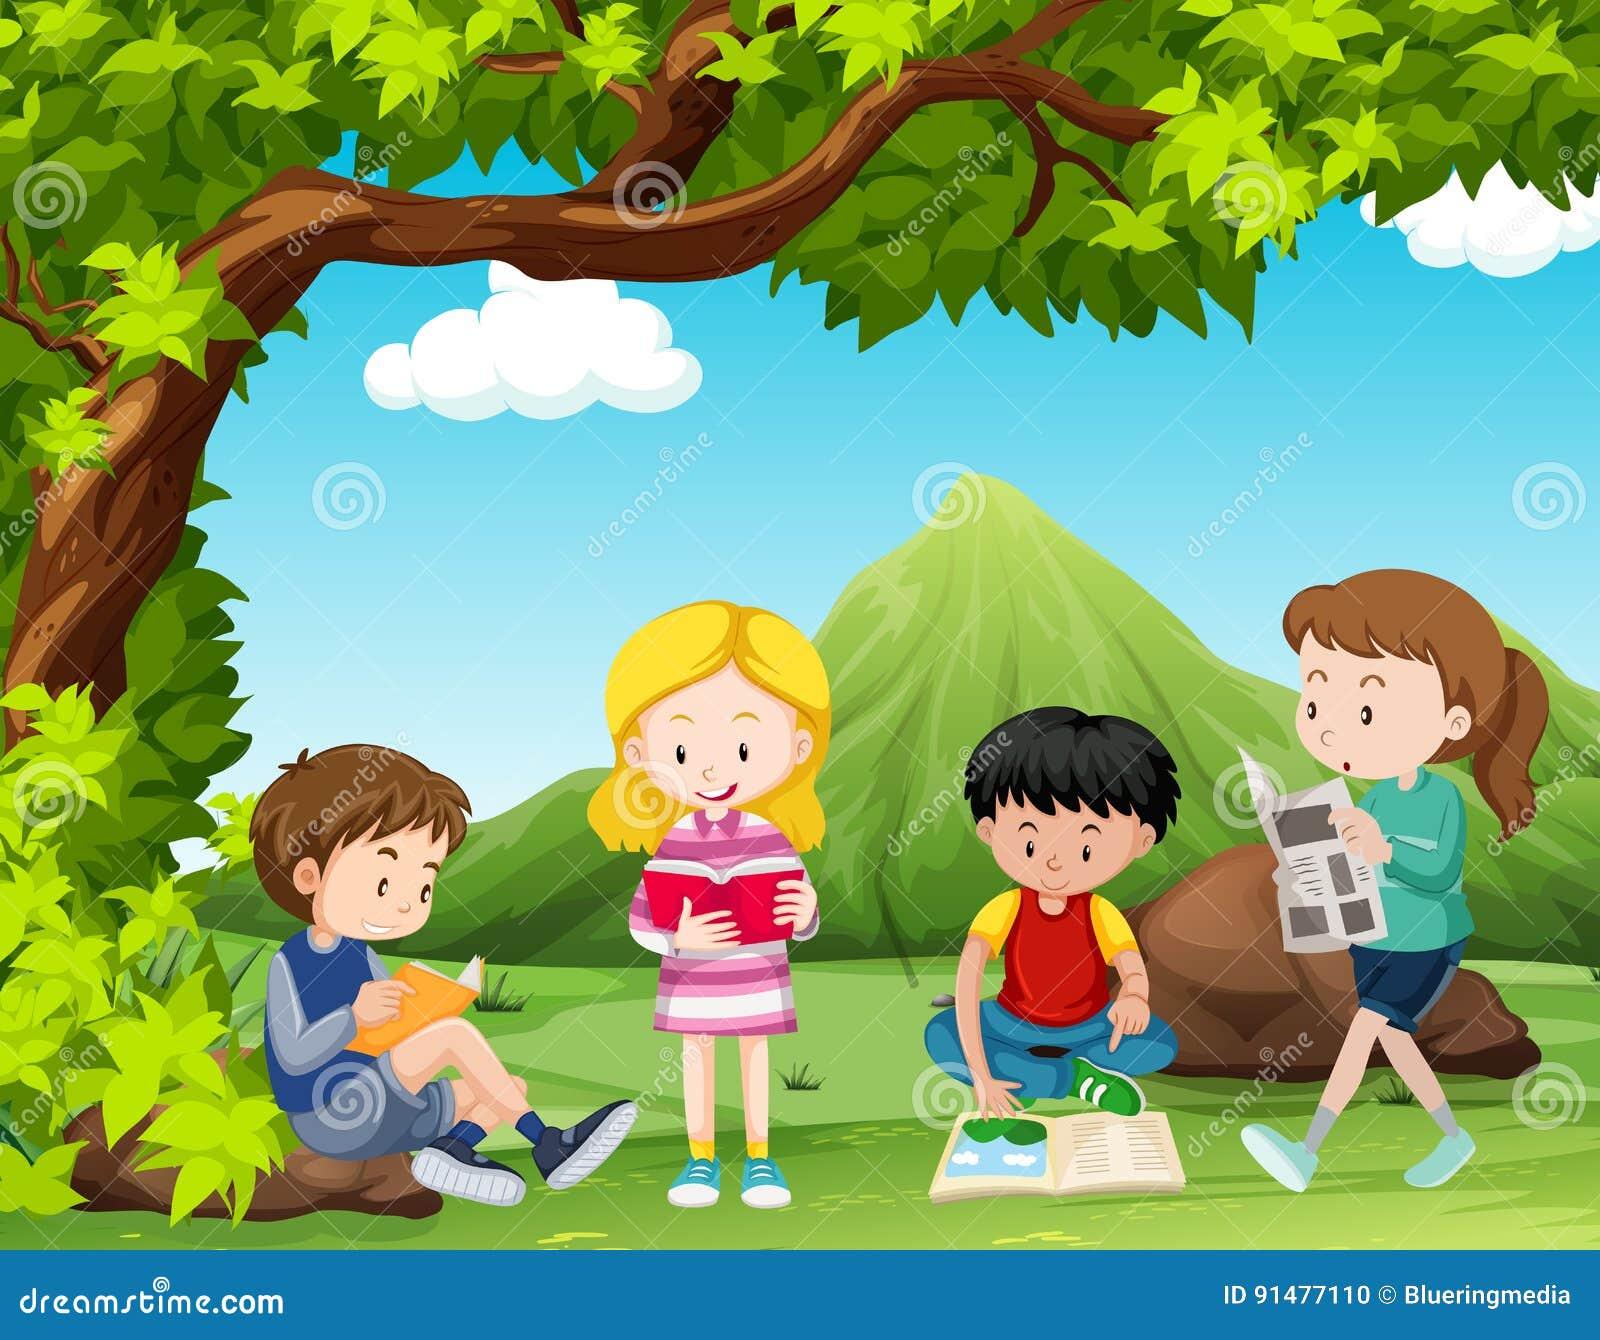 four kids reading books under the tree stock illustration